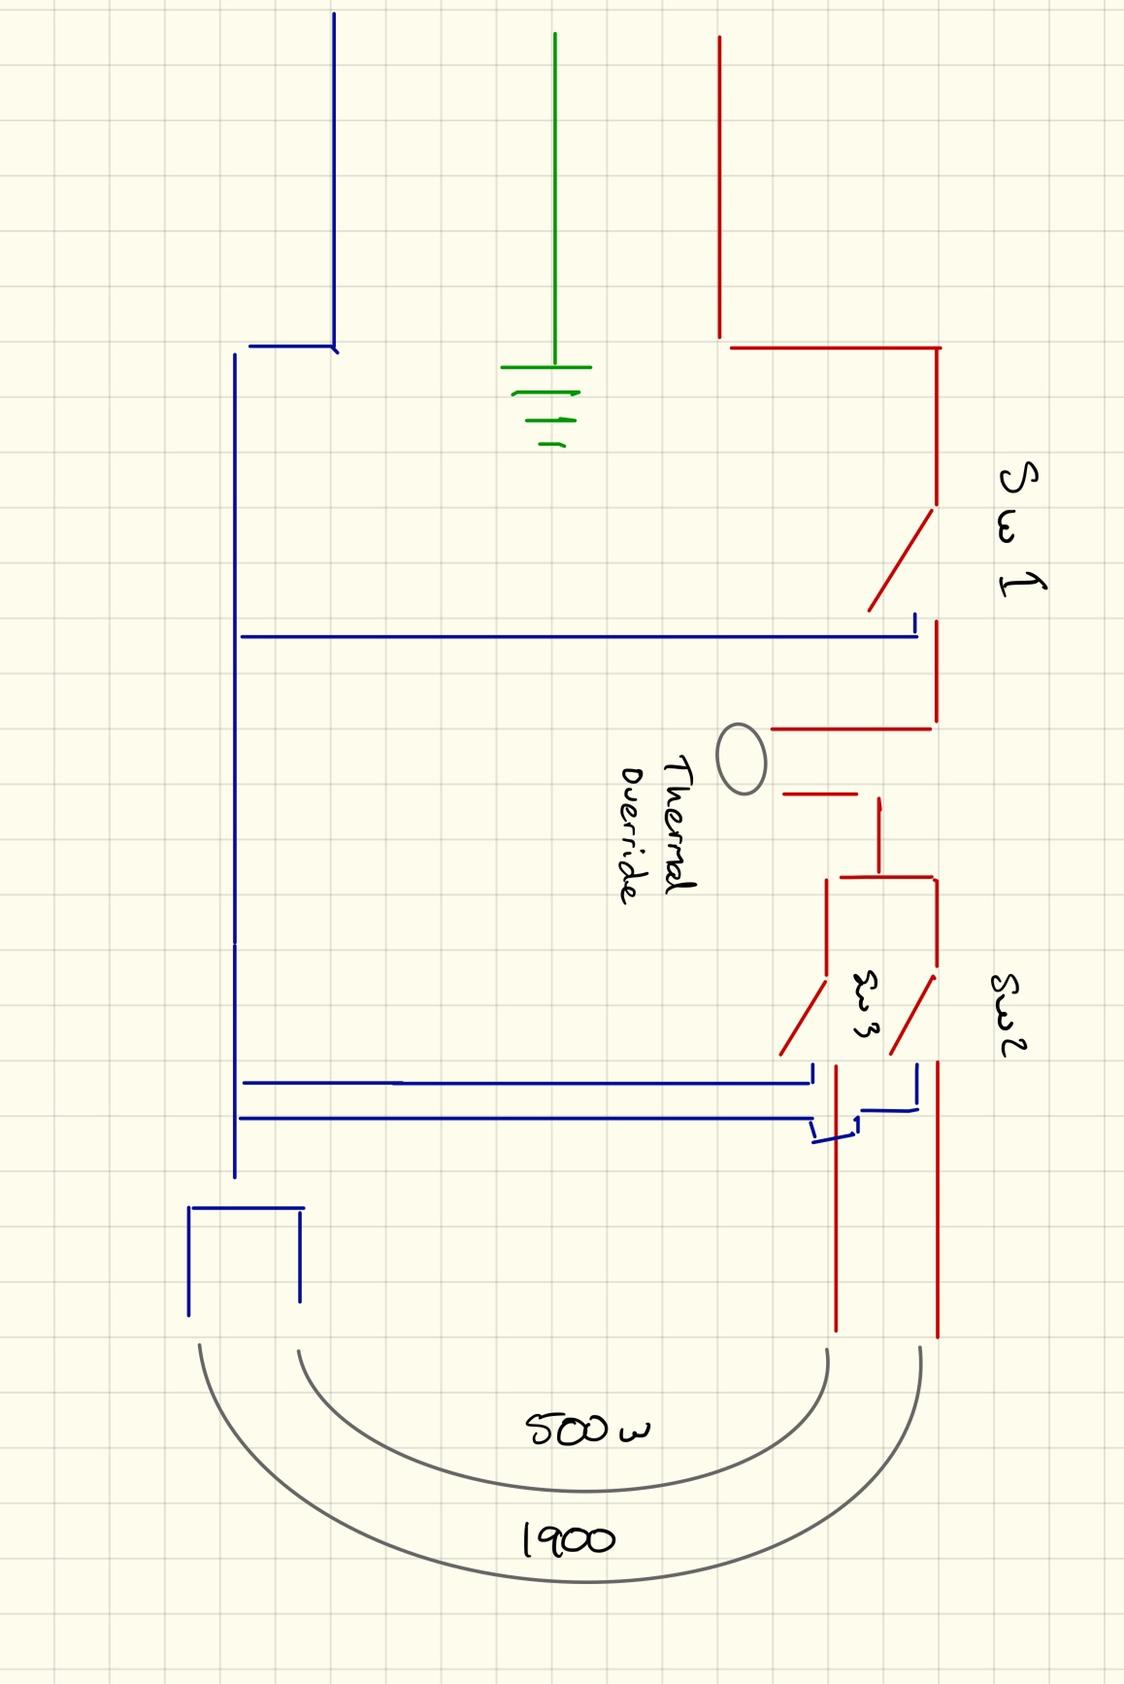 IMG_3F83E43BCF60-1.jpeg